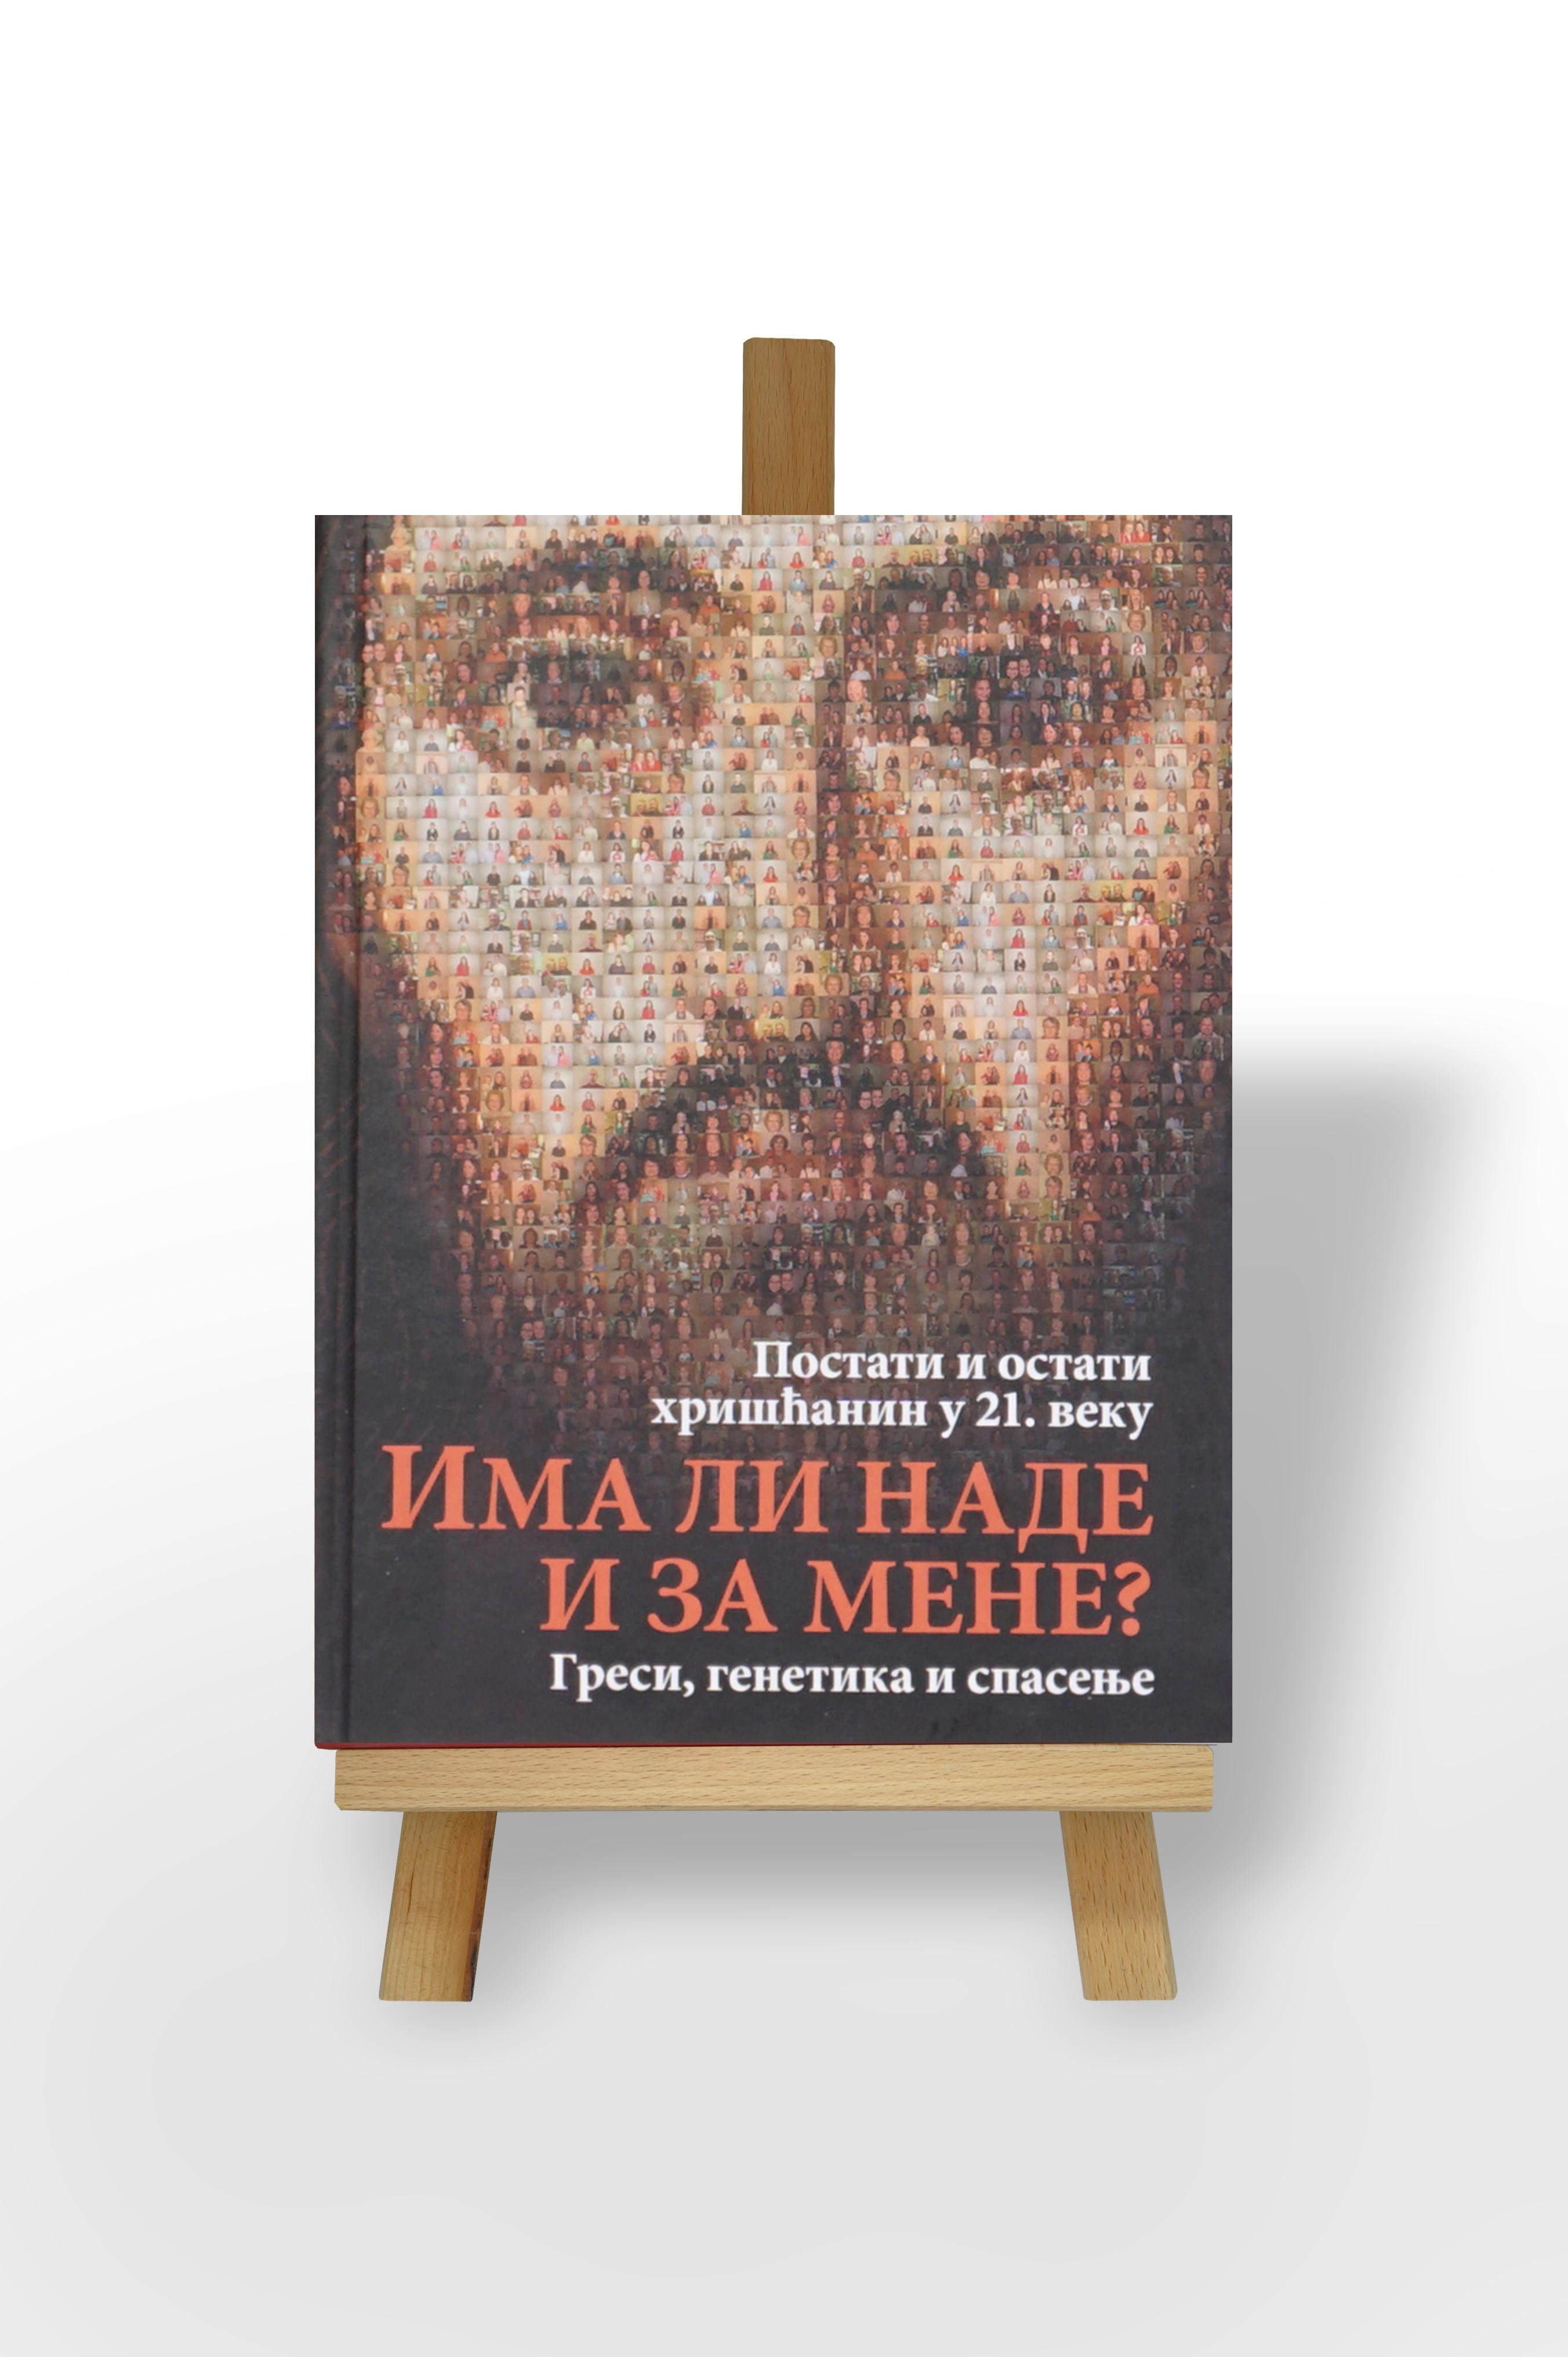 Ima li nade i za mene? Postati i ostati hrišćanin u 21. veku: gresi, genetika i spasenje